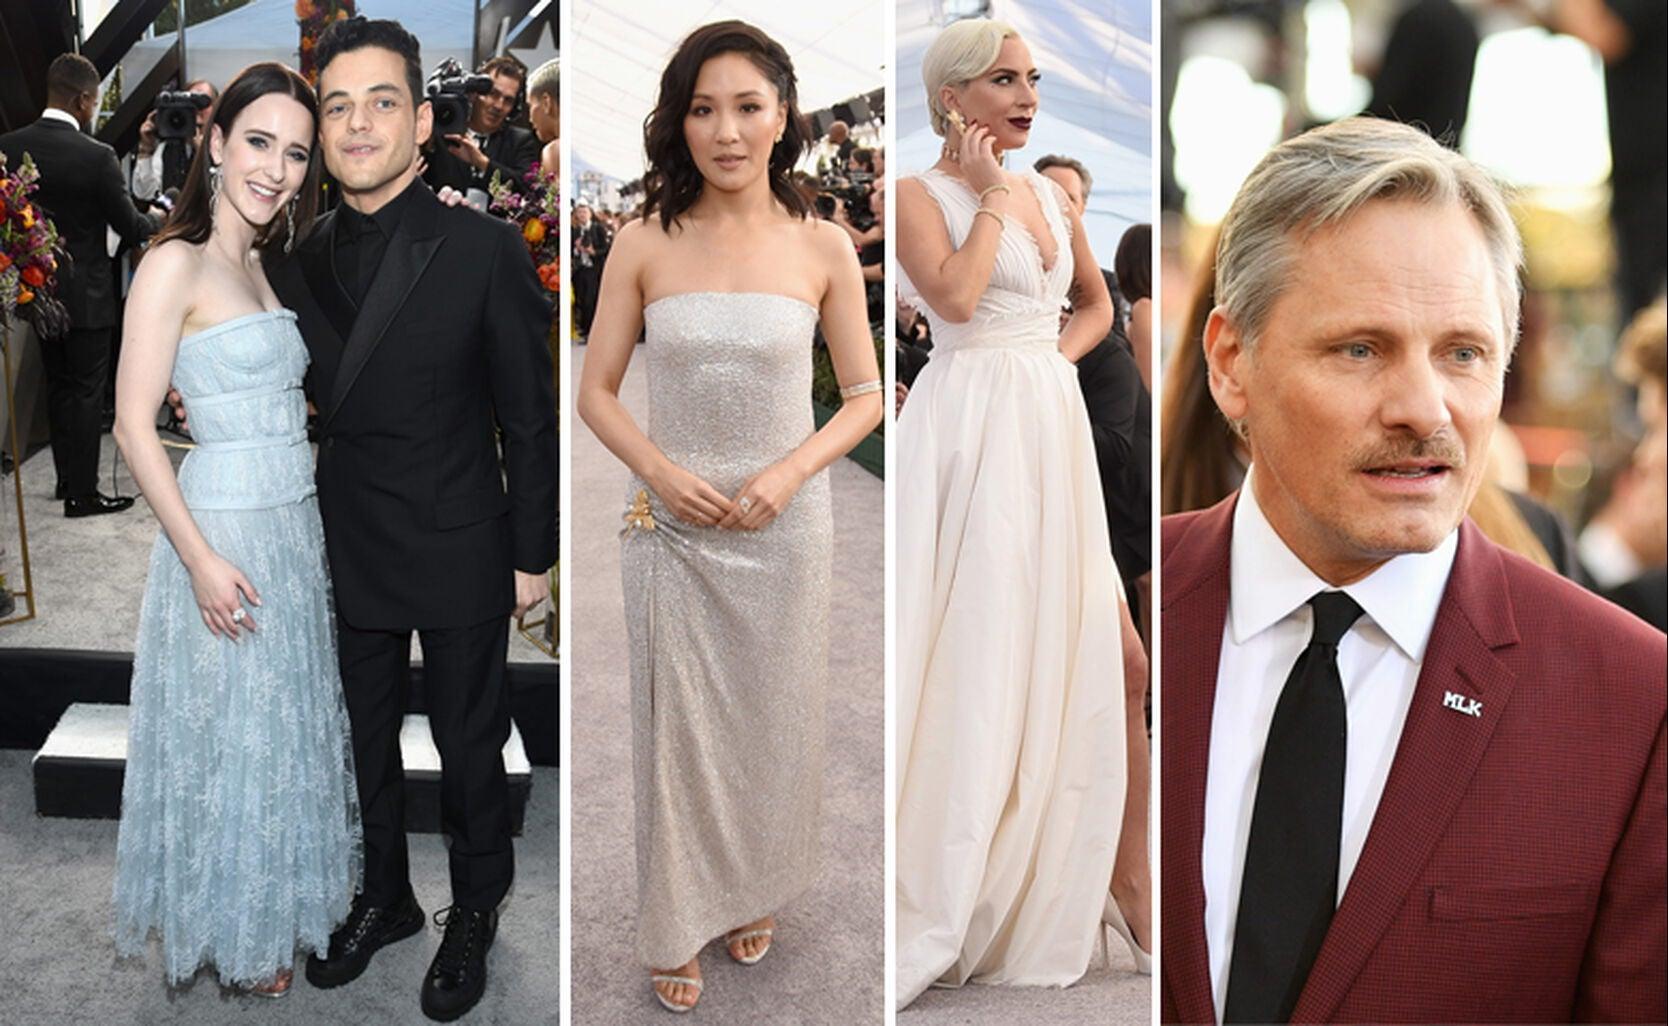 Rachel Brosnahan with Rami Malek, Constance Wu, Lady Gaga, Viggo Mortensen